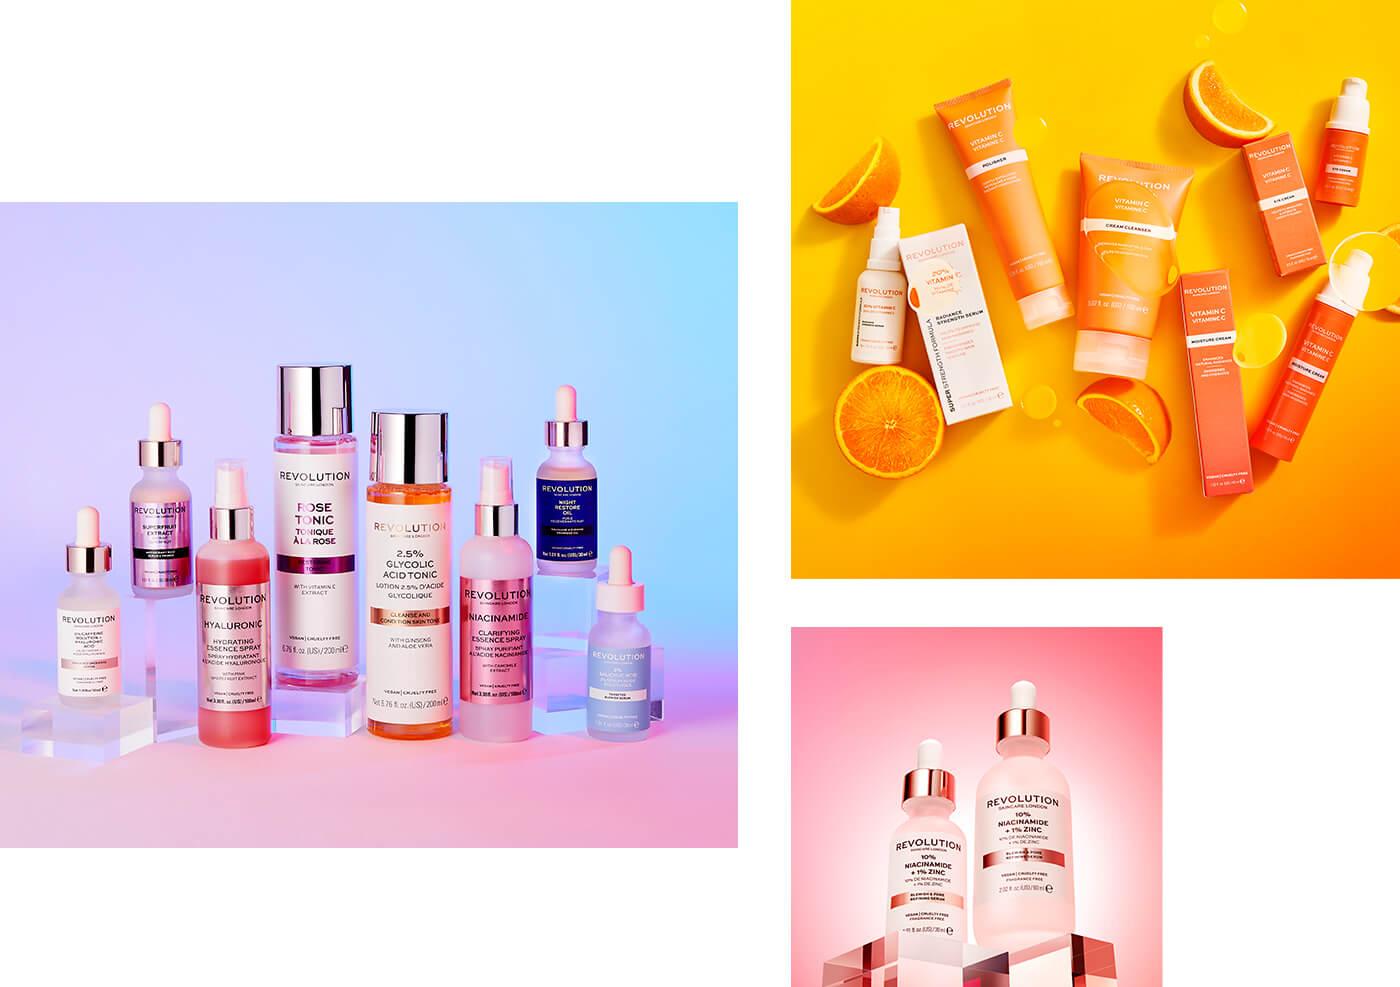 Revolution Skincare